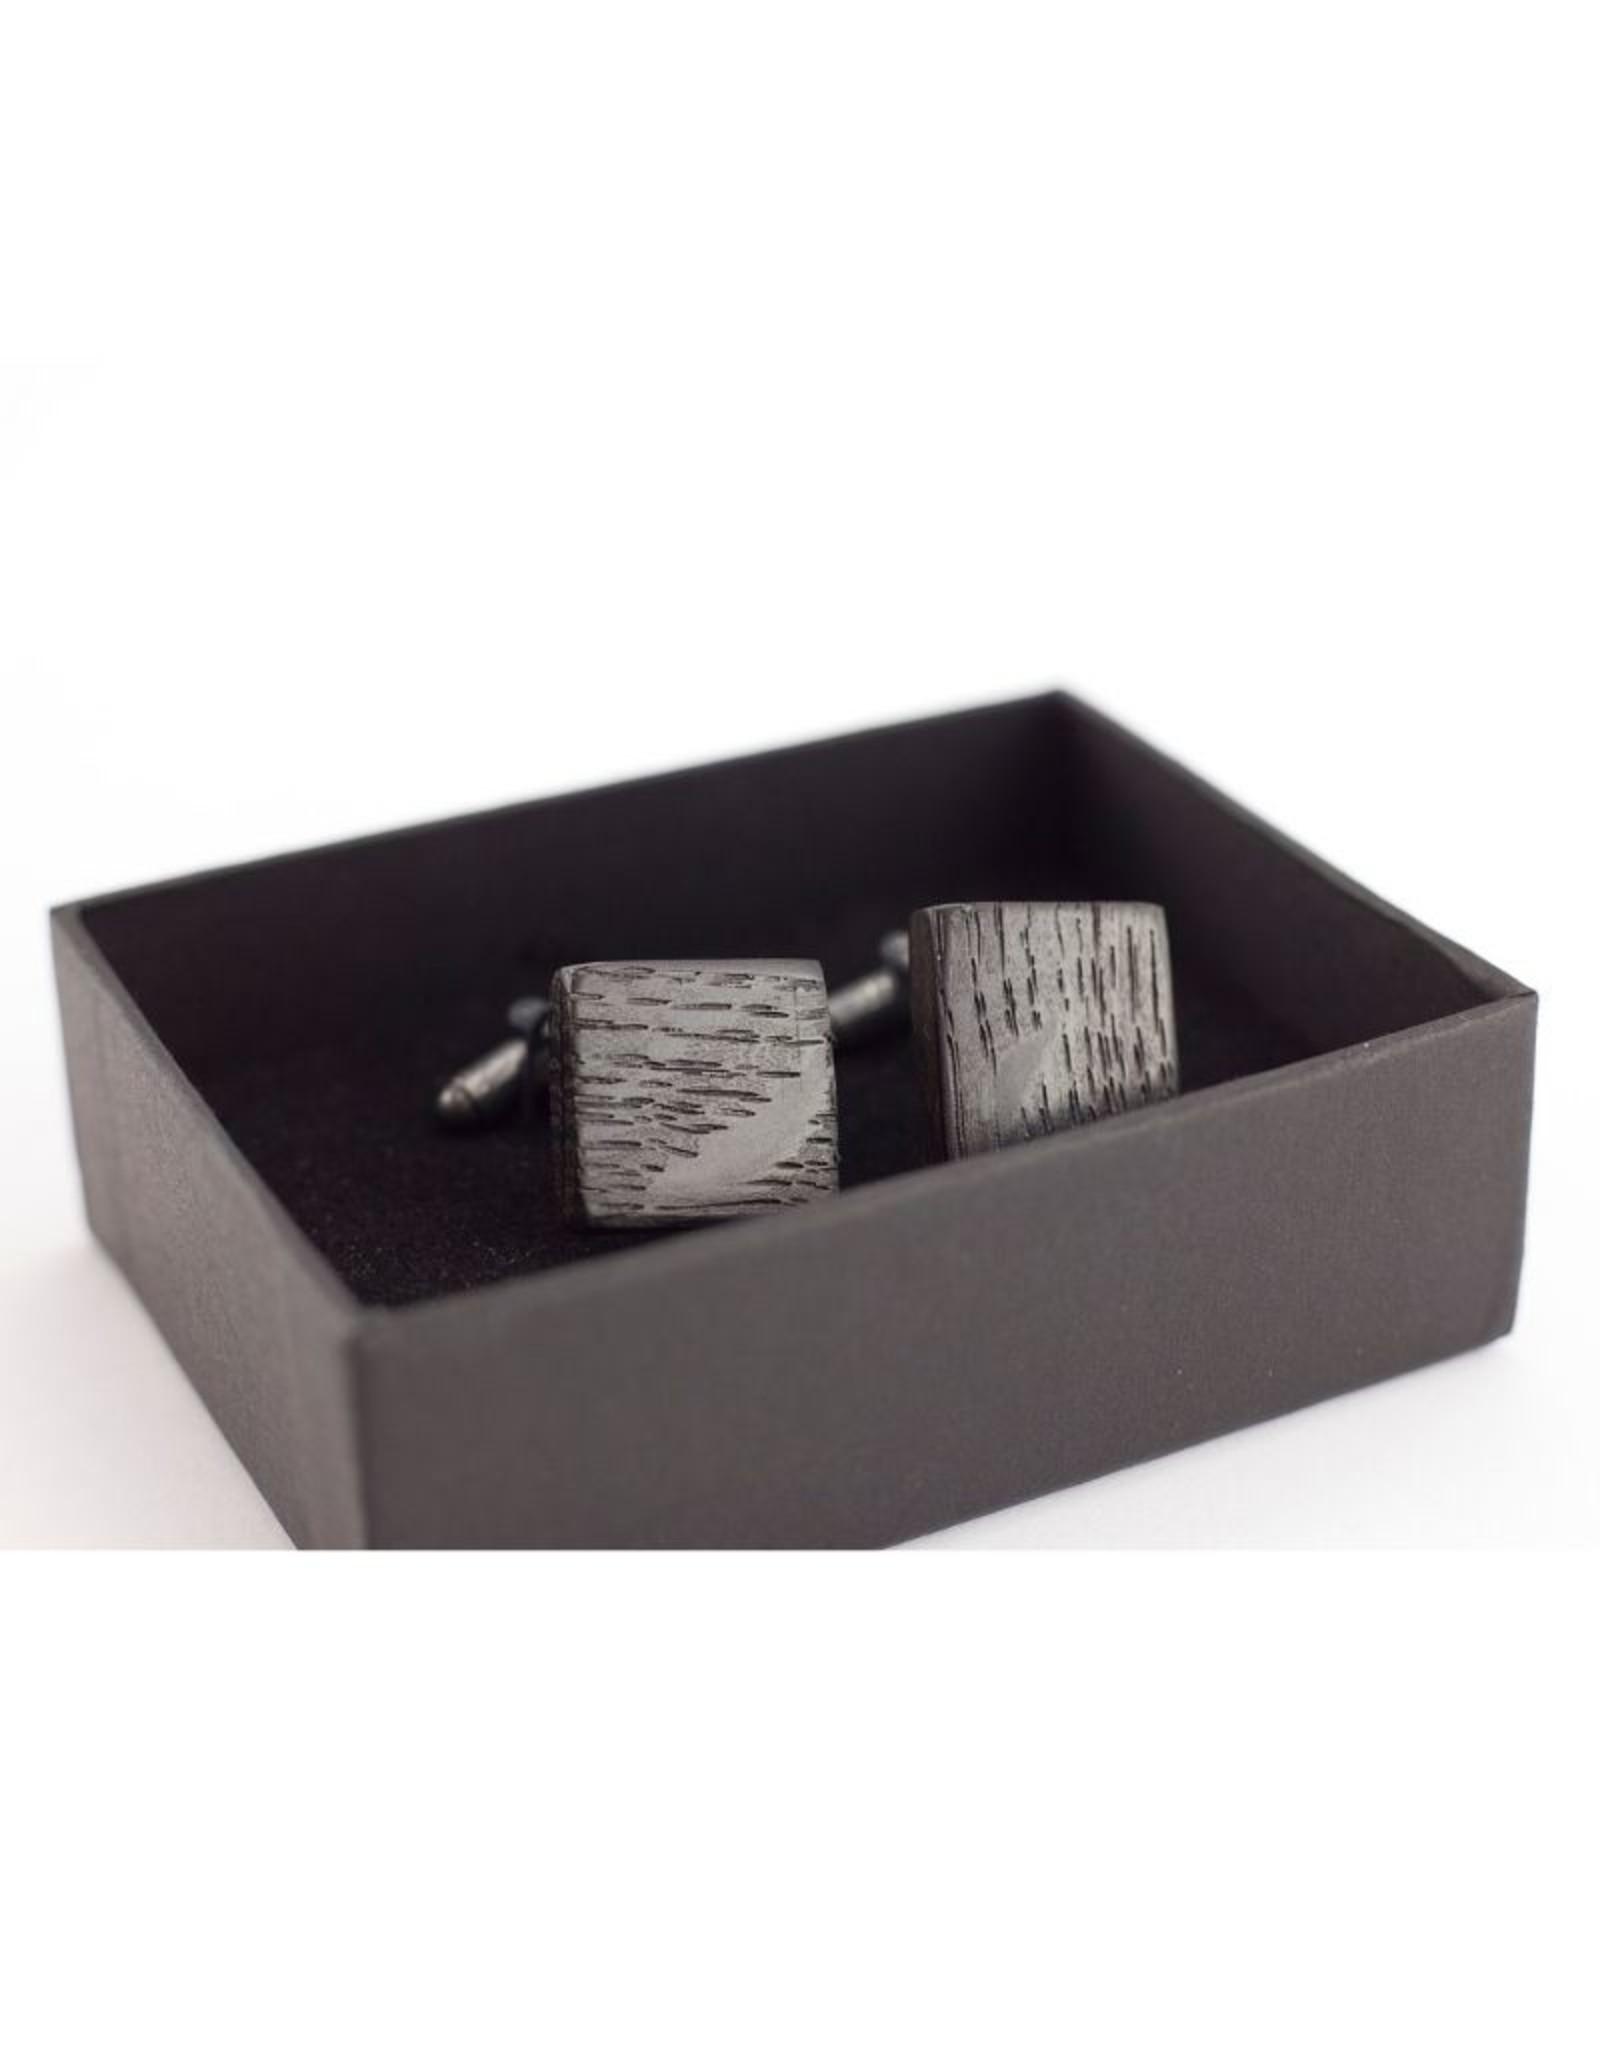 Leko & Leko Jewellery Leko & Leko -Square Cufflinks